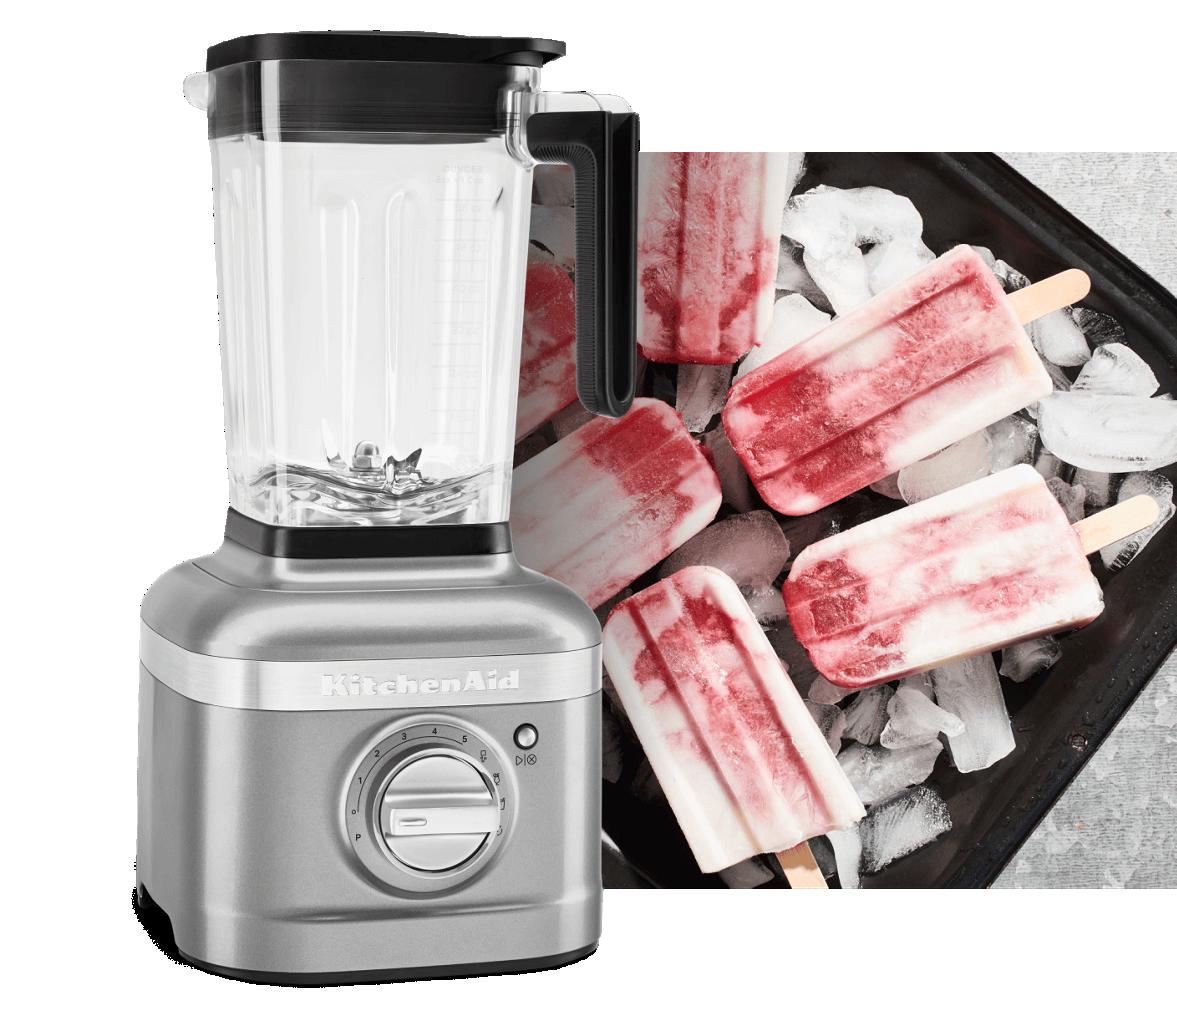 Premium Kitchen Countertop Appliances Kitchenaid